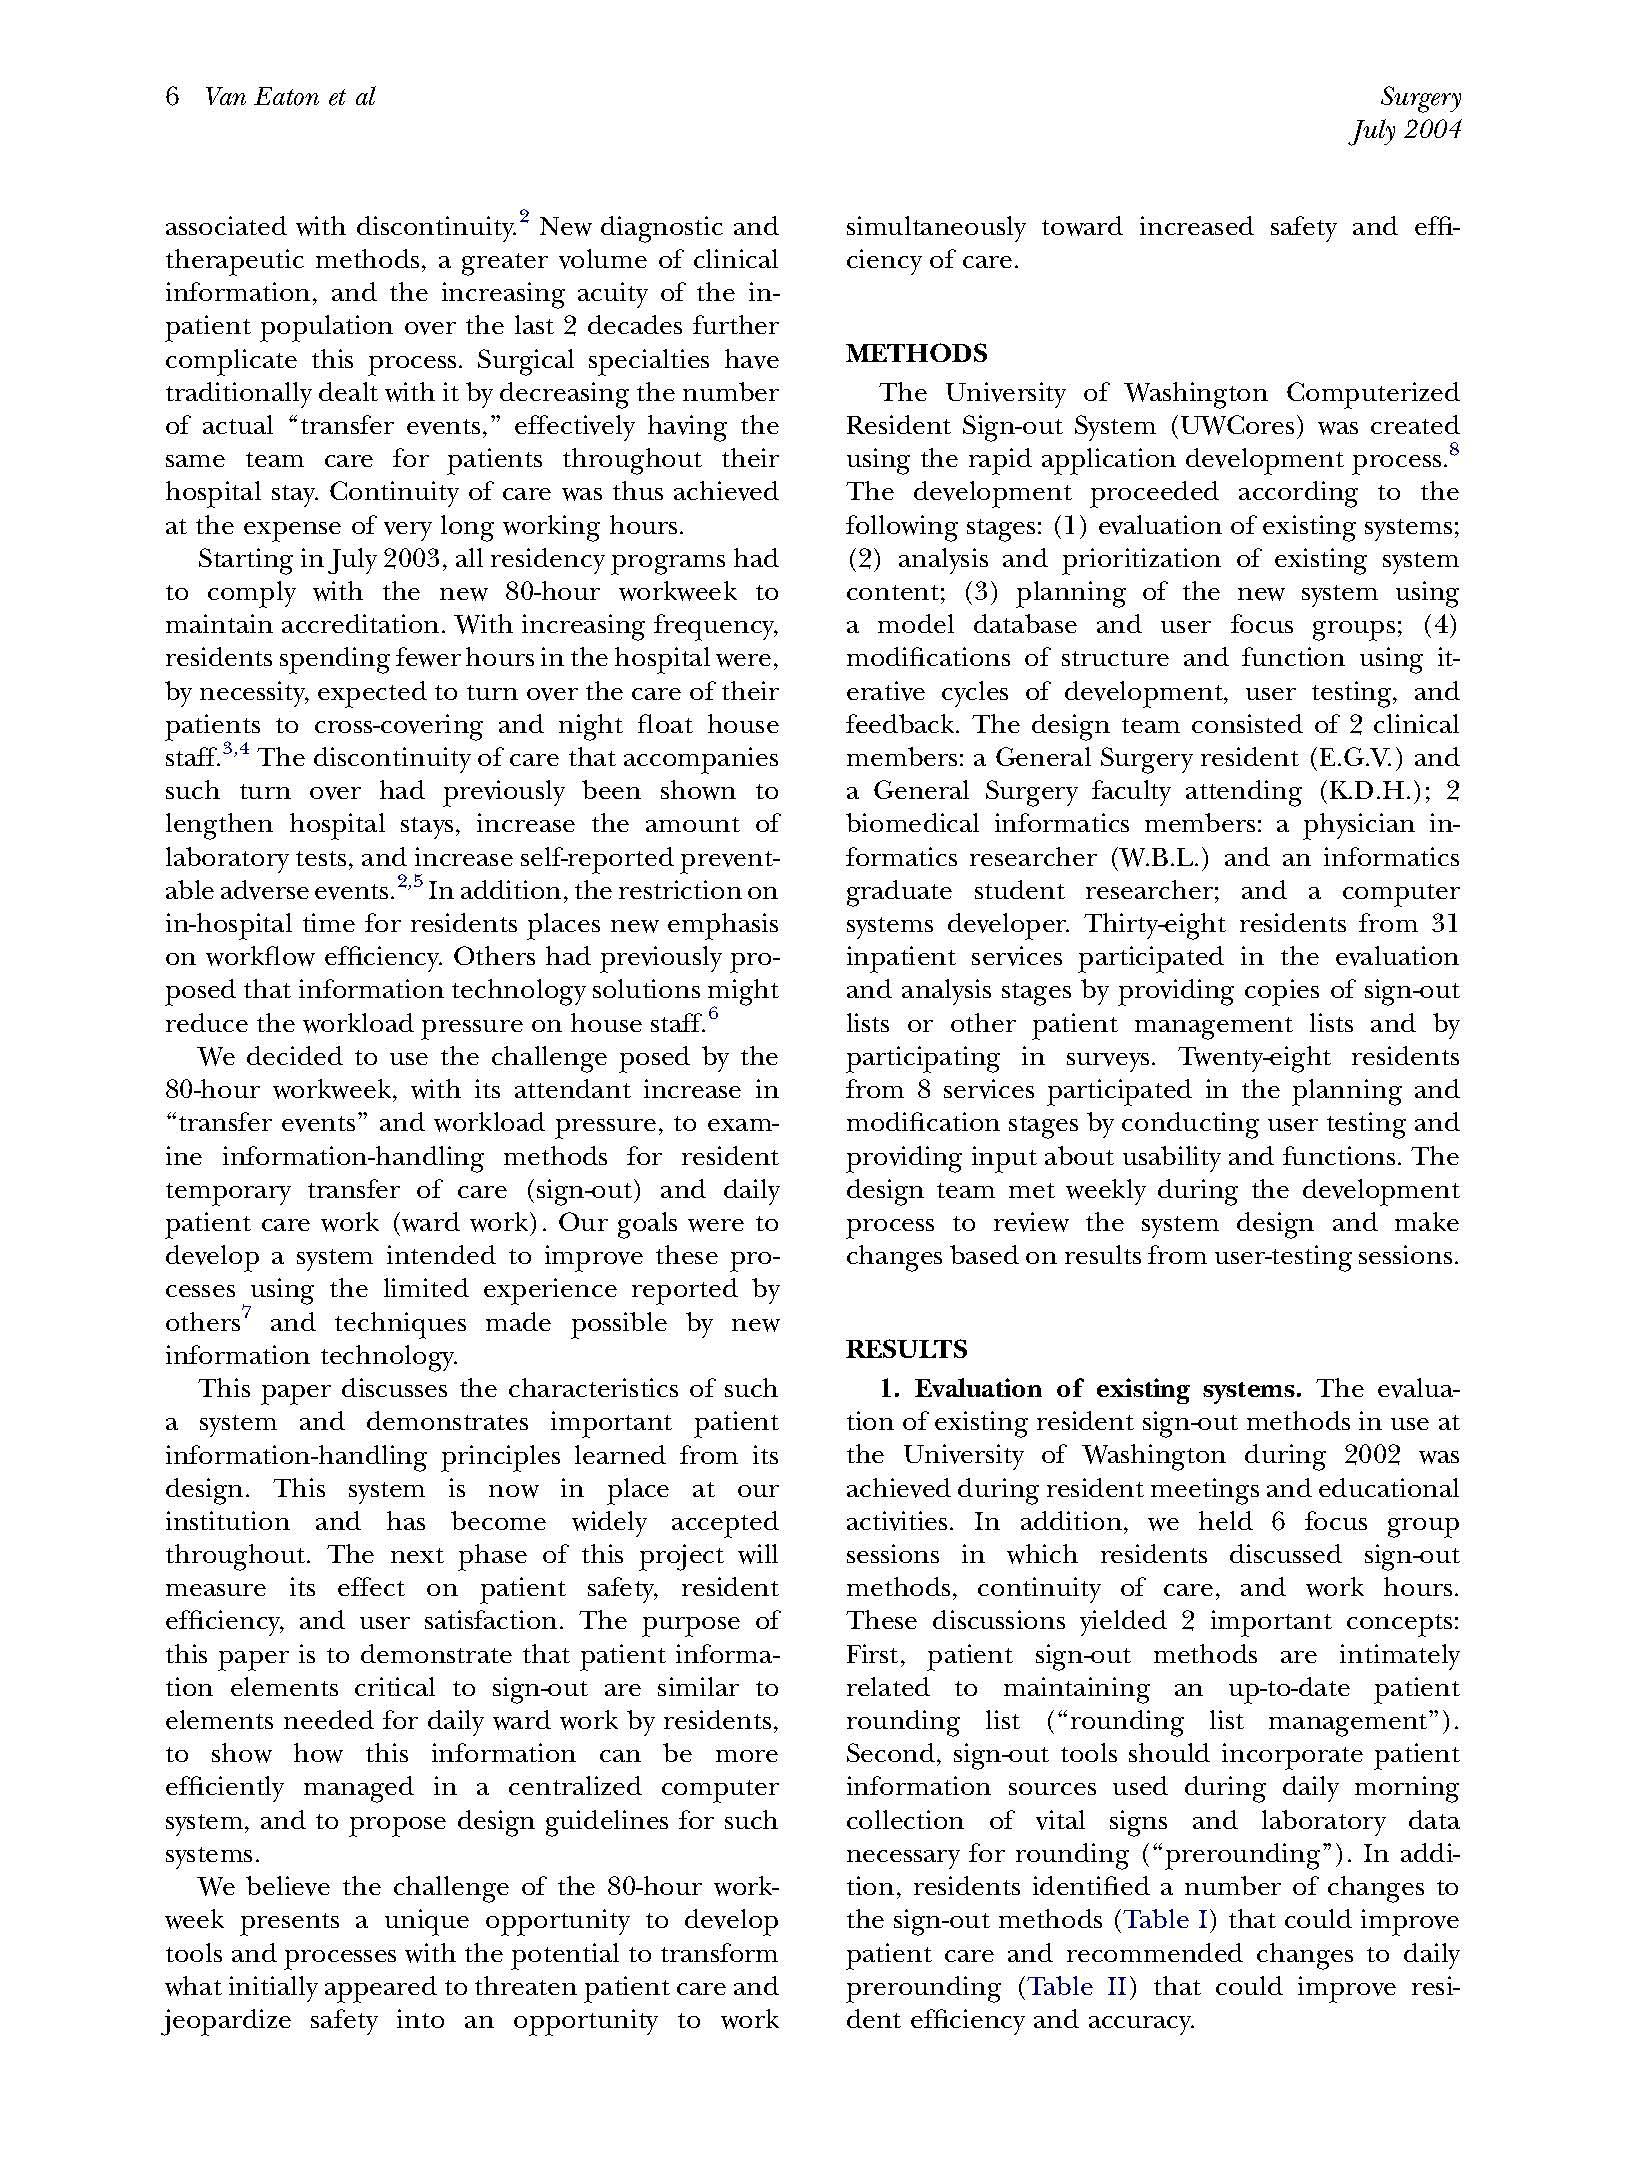 VanEatonEG-OrganizingTransferPatientCareInformation-Surgery2004_Page_2.jpg